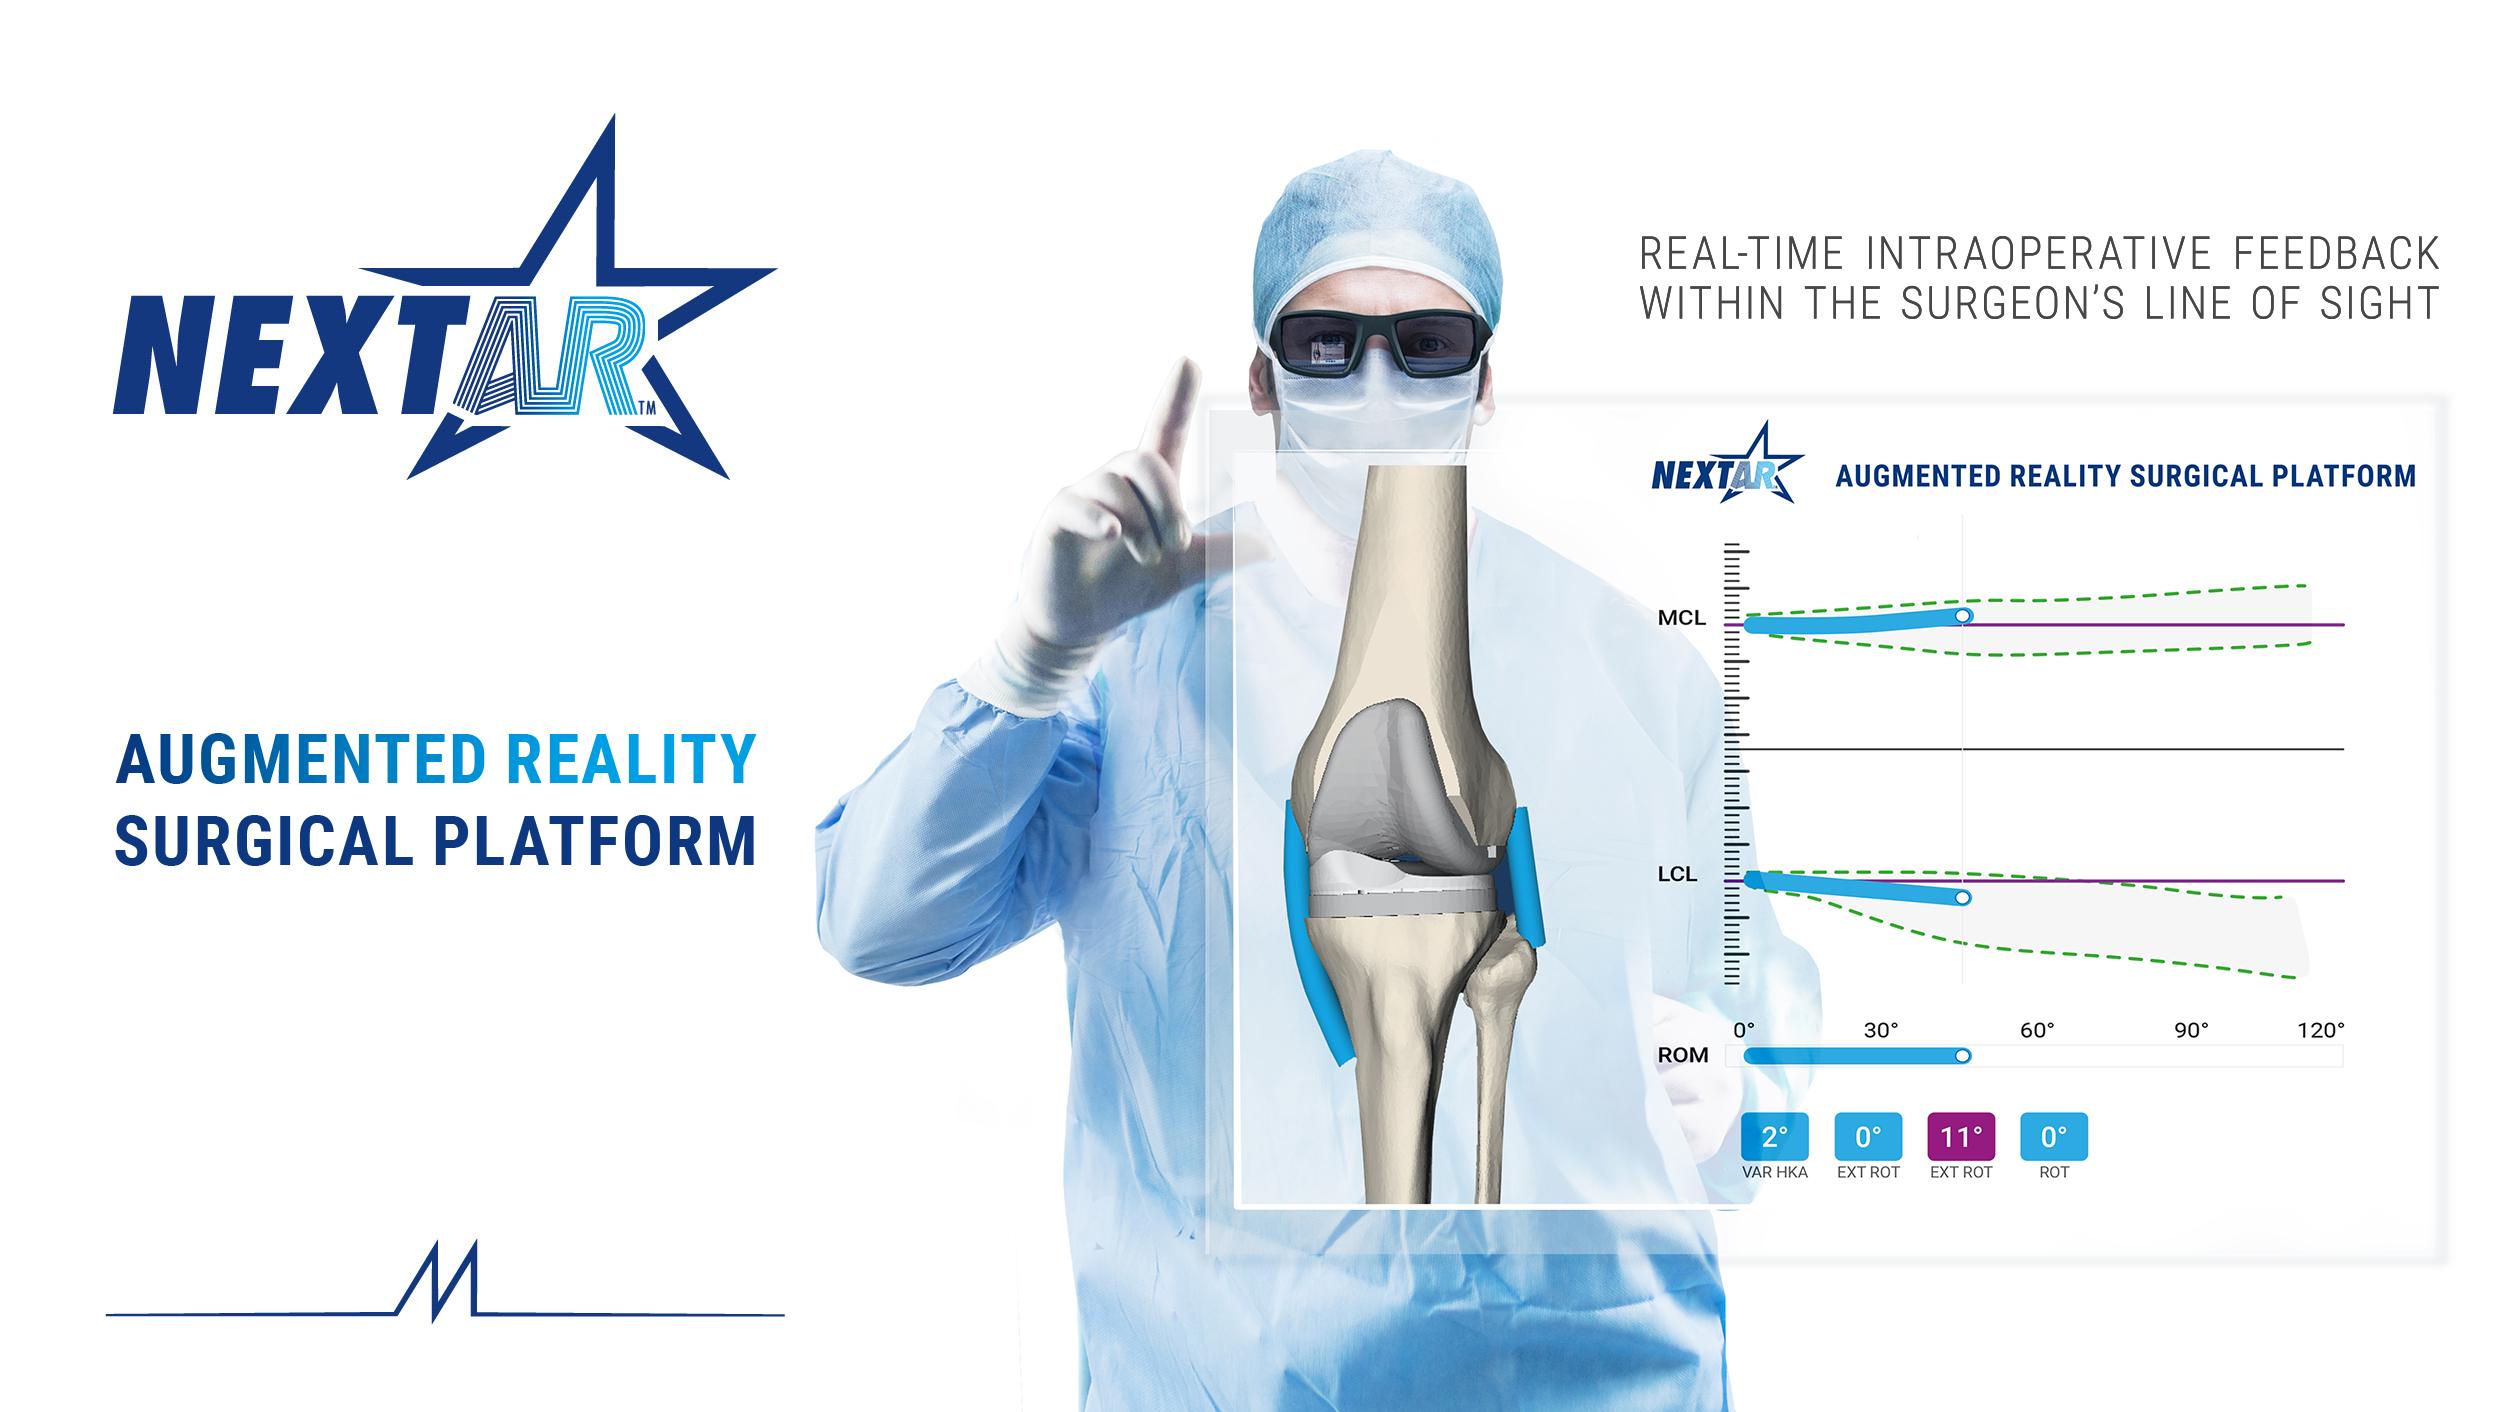 Medacta Corporate | MEDACTA INTERNATIONAL